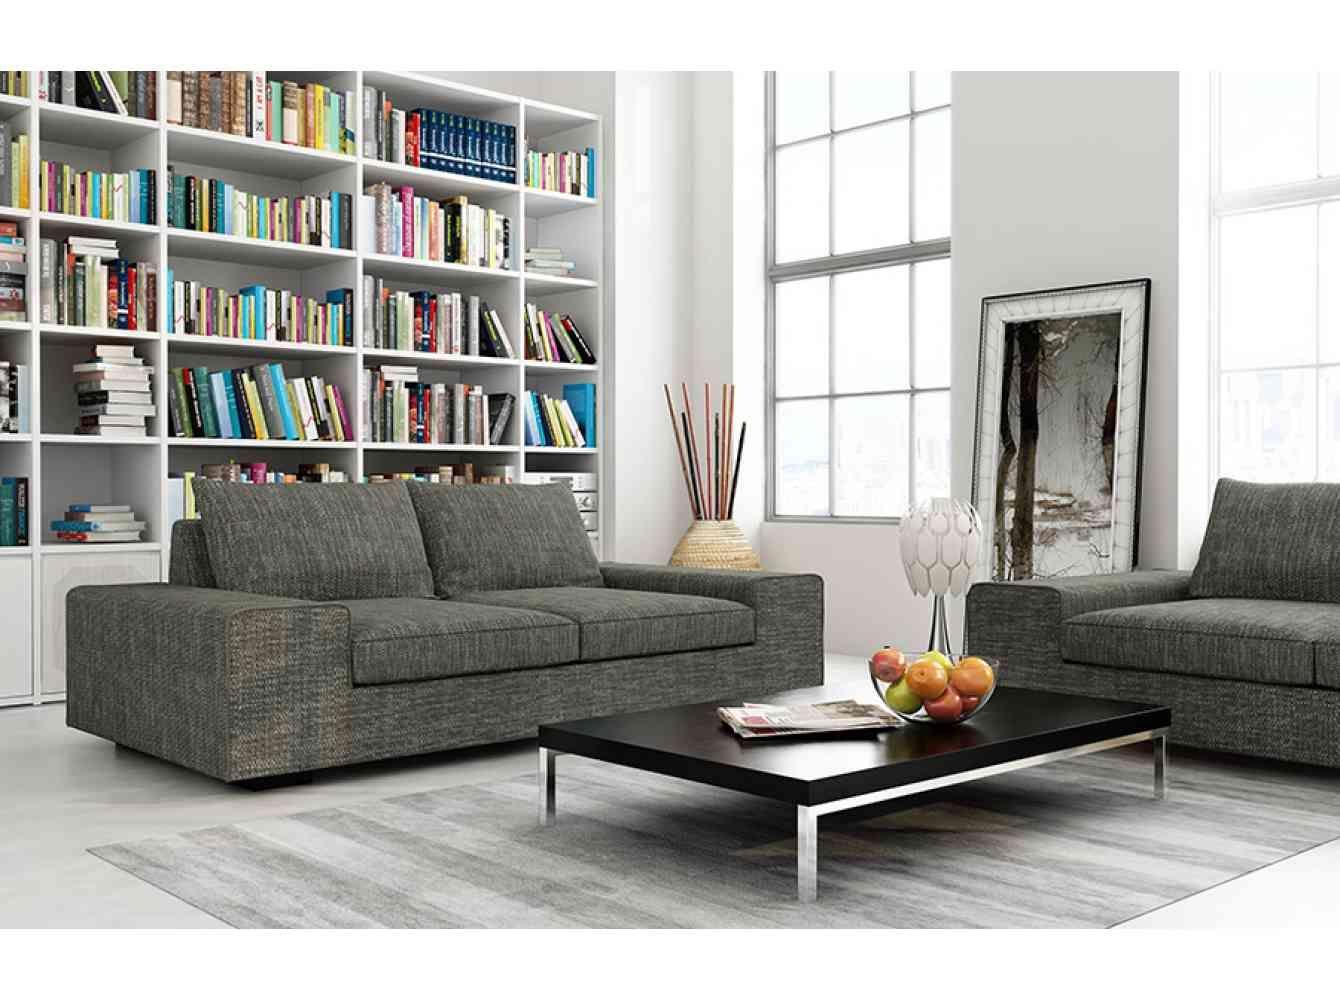 Blumen Sofa Living Room Furniture Uk Furniture Living